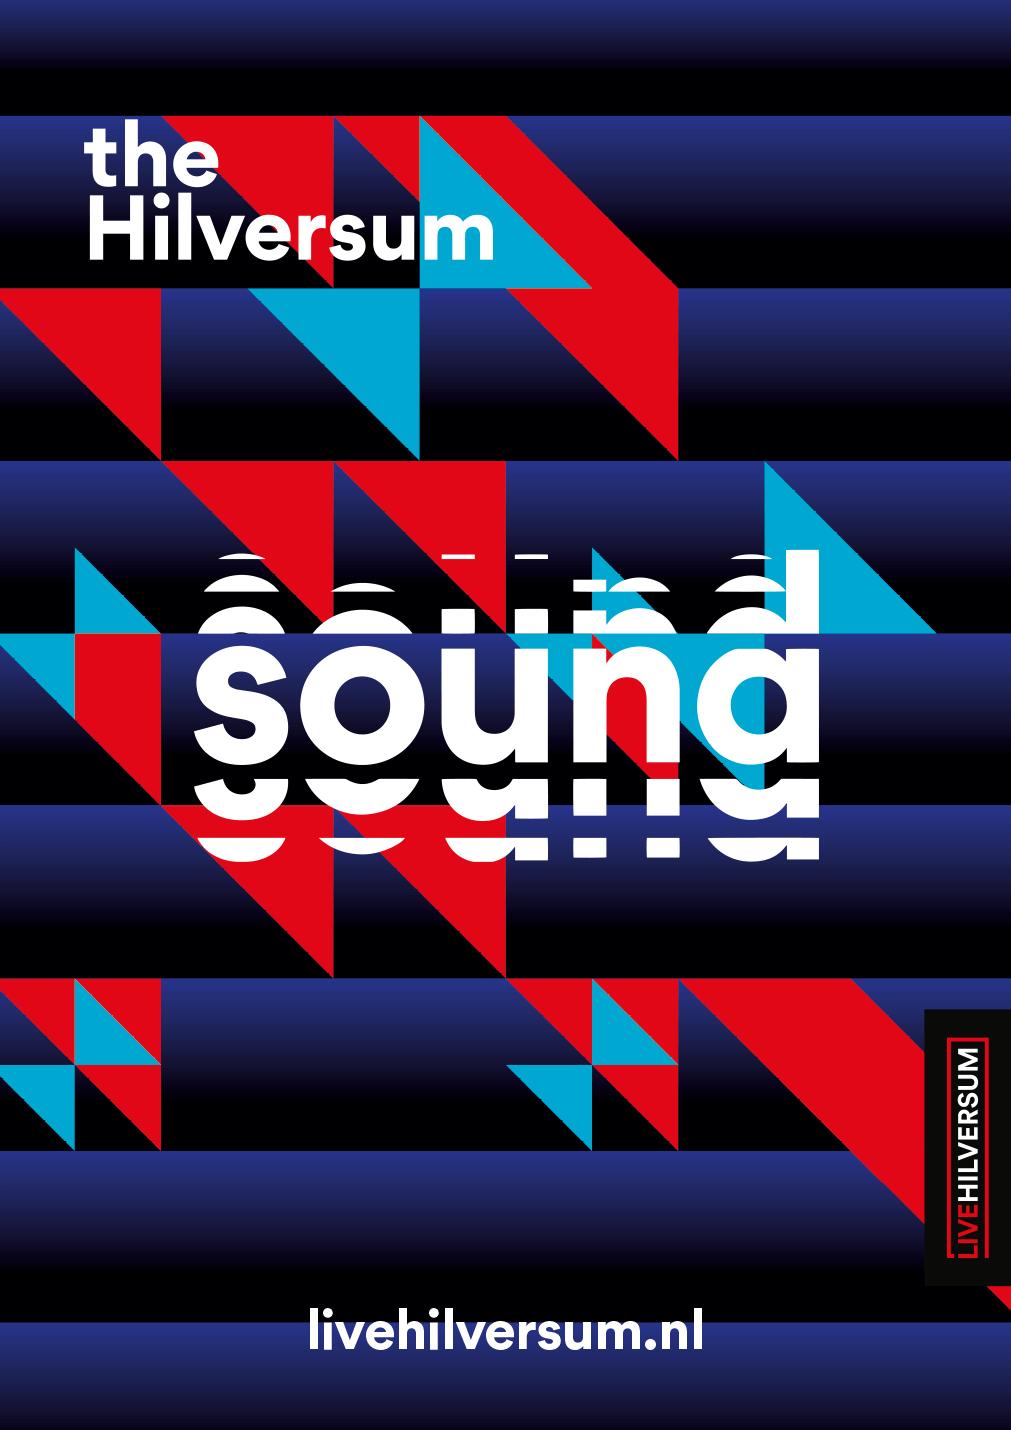 TheHilversumSound_1